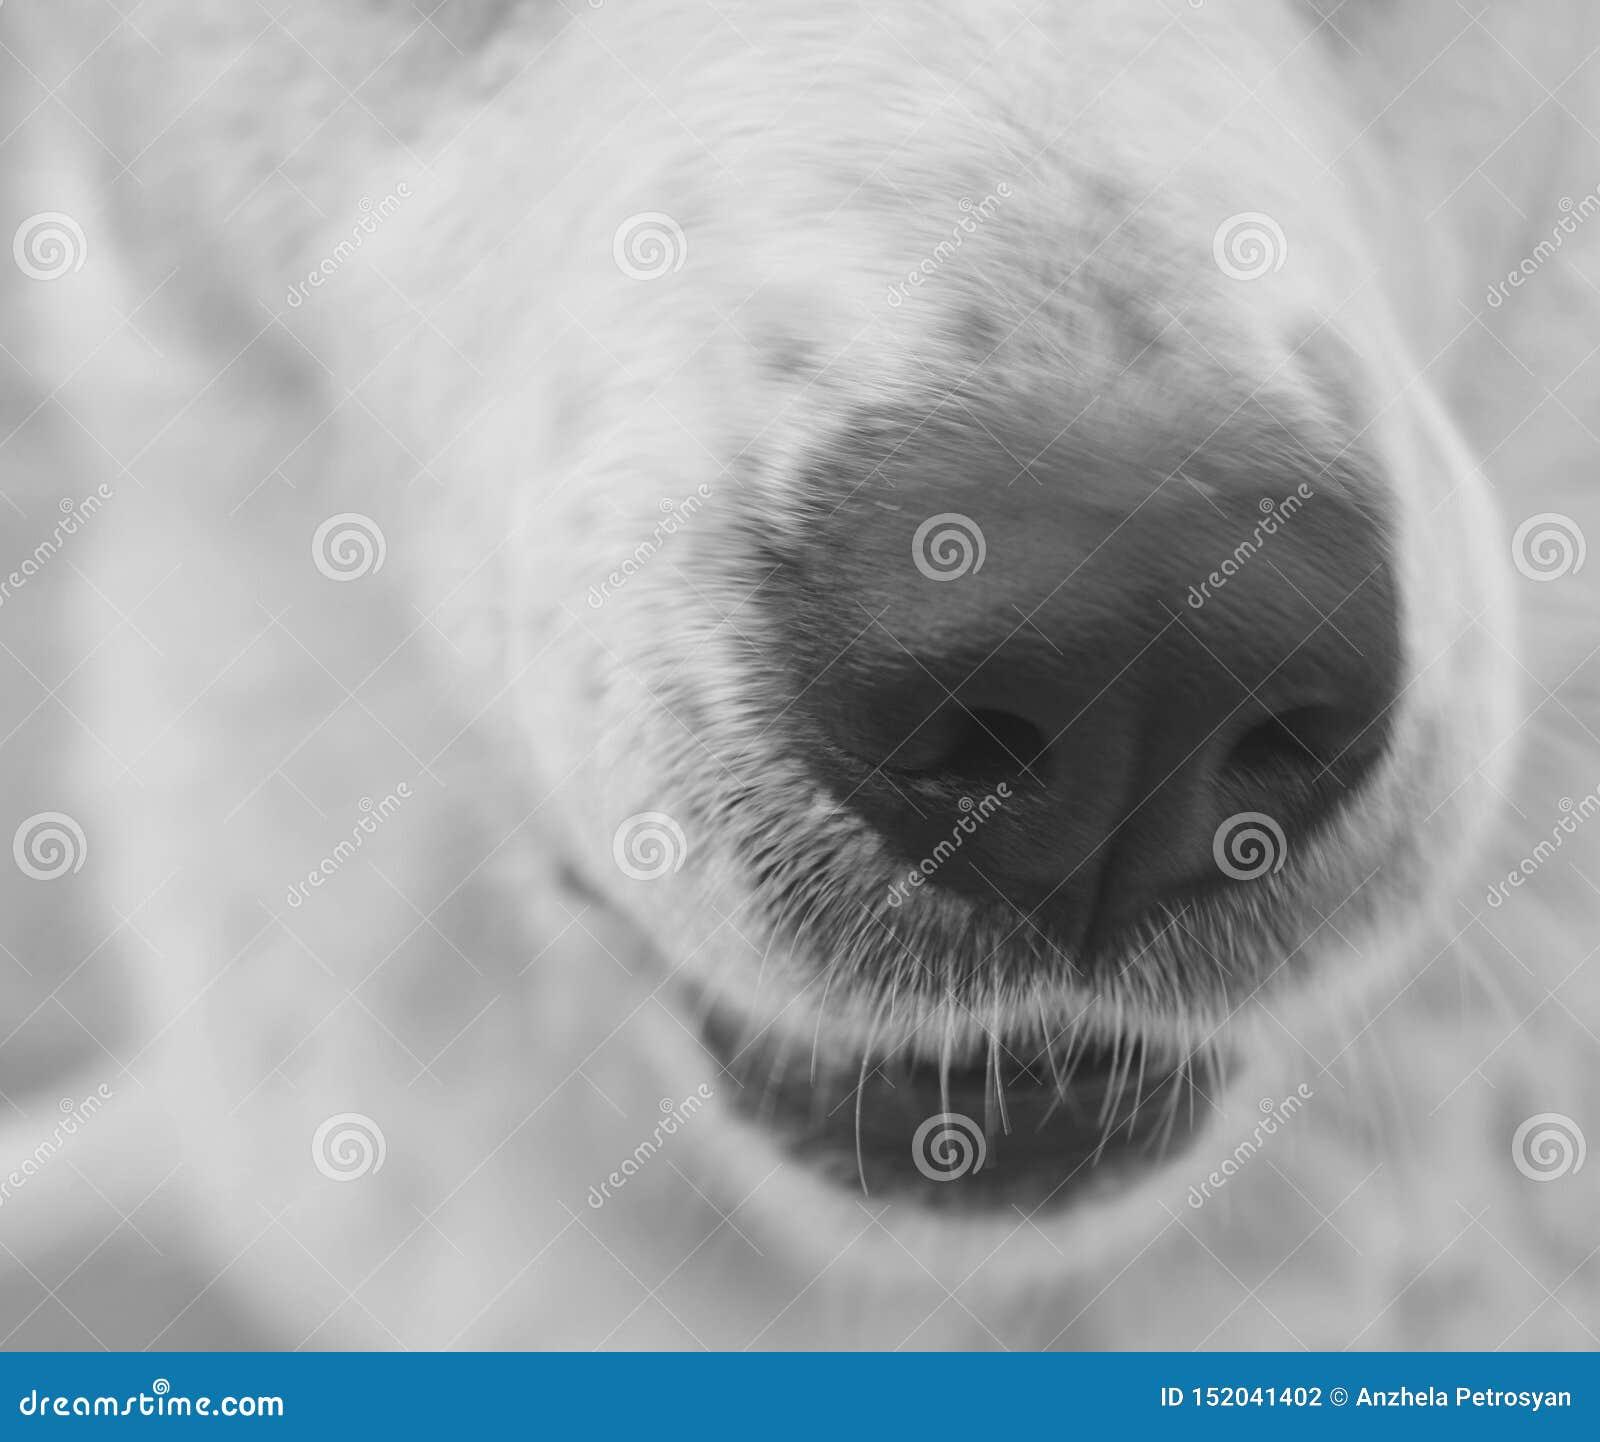 Nariz de cão branco